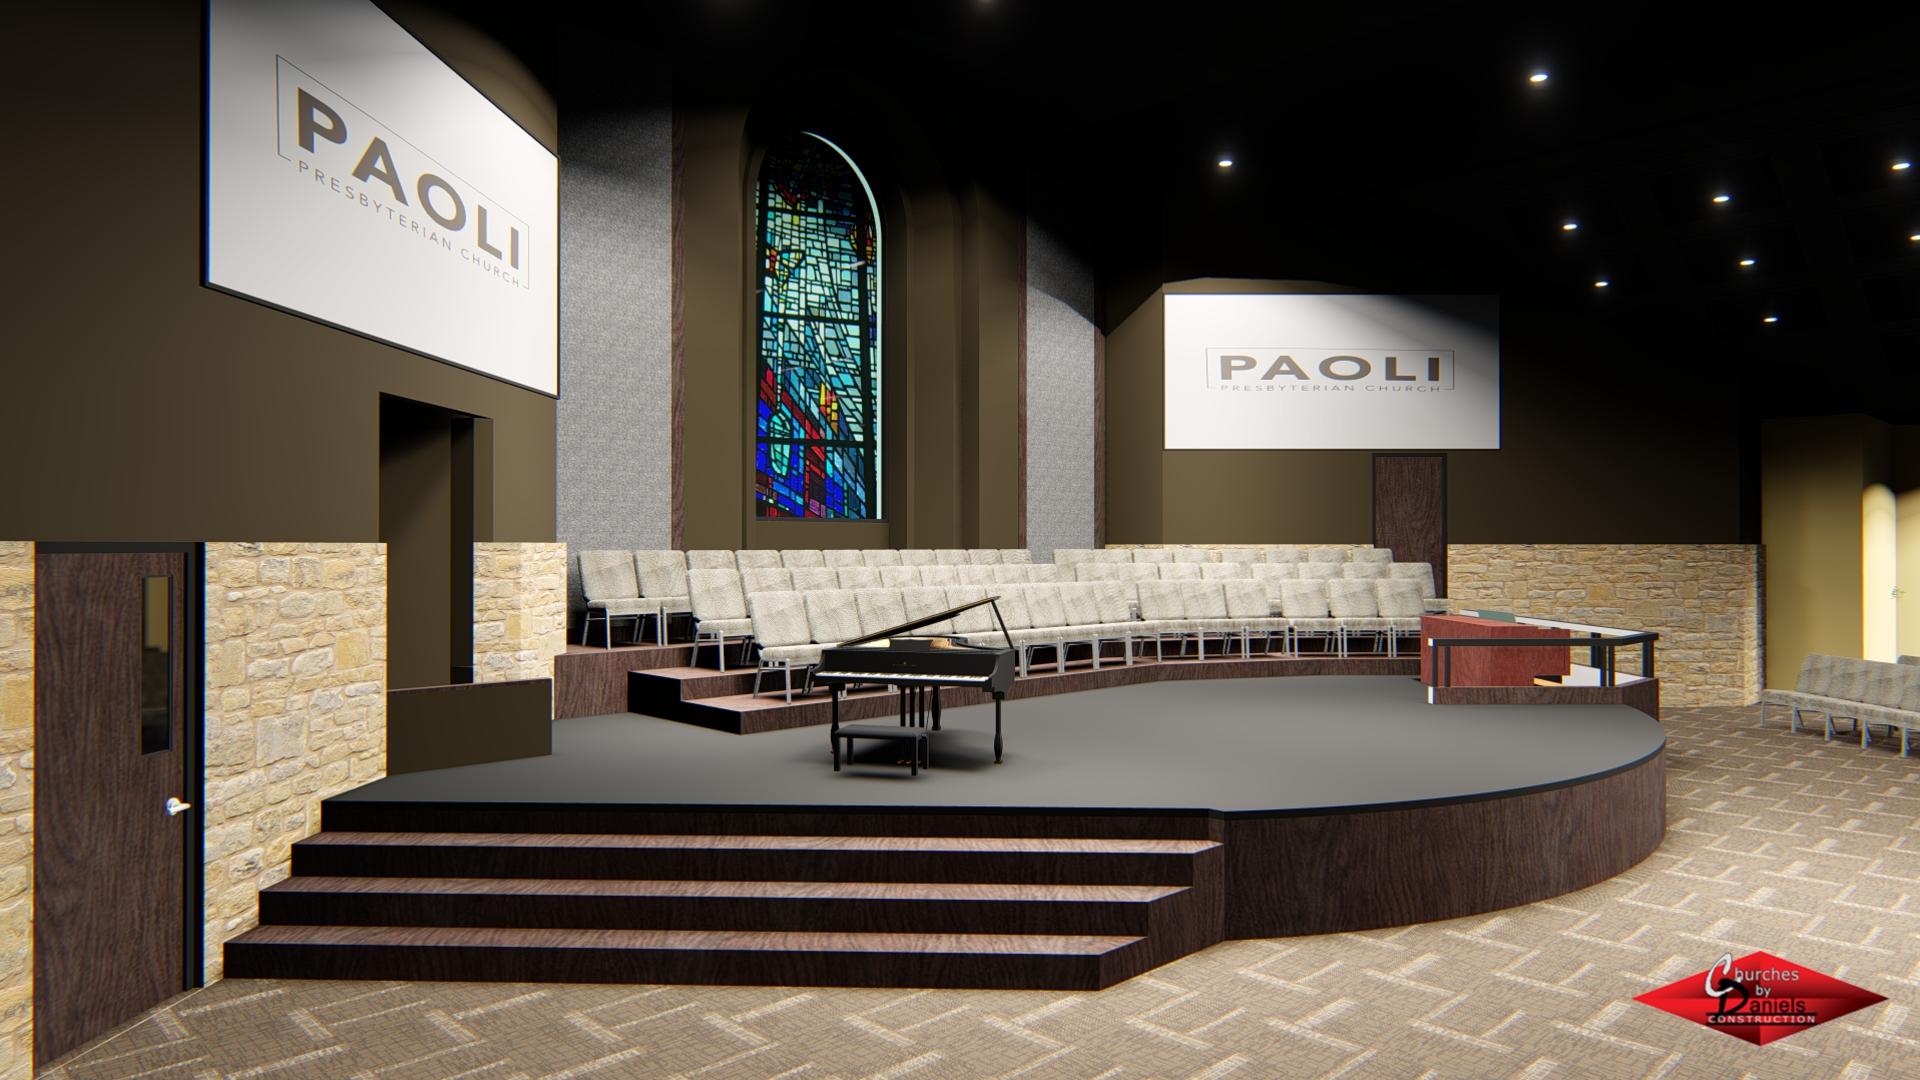 Worship_15 - Photo sanct choir front onl